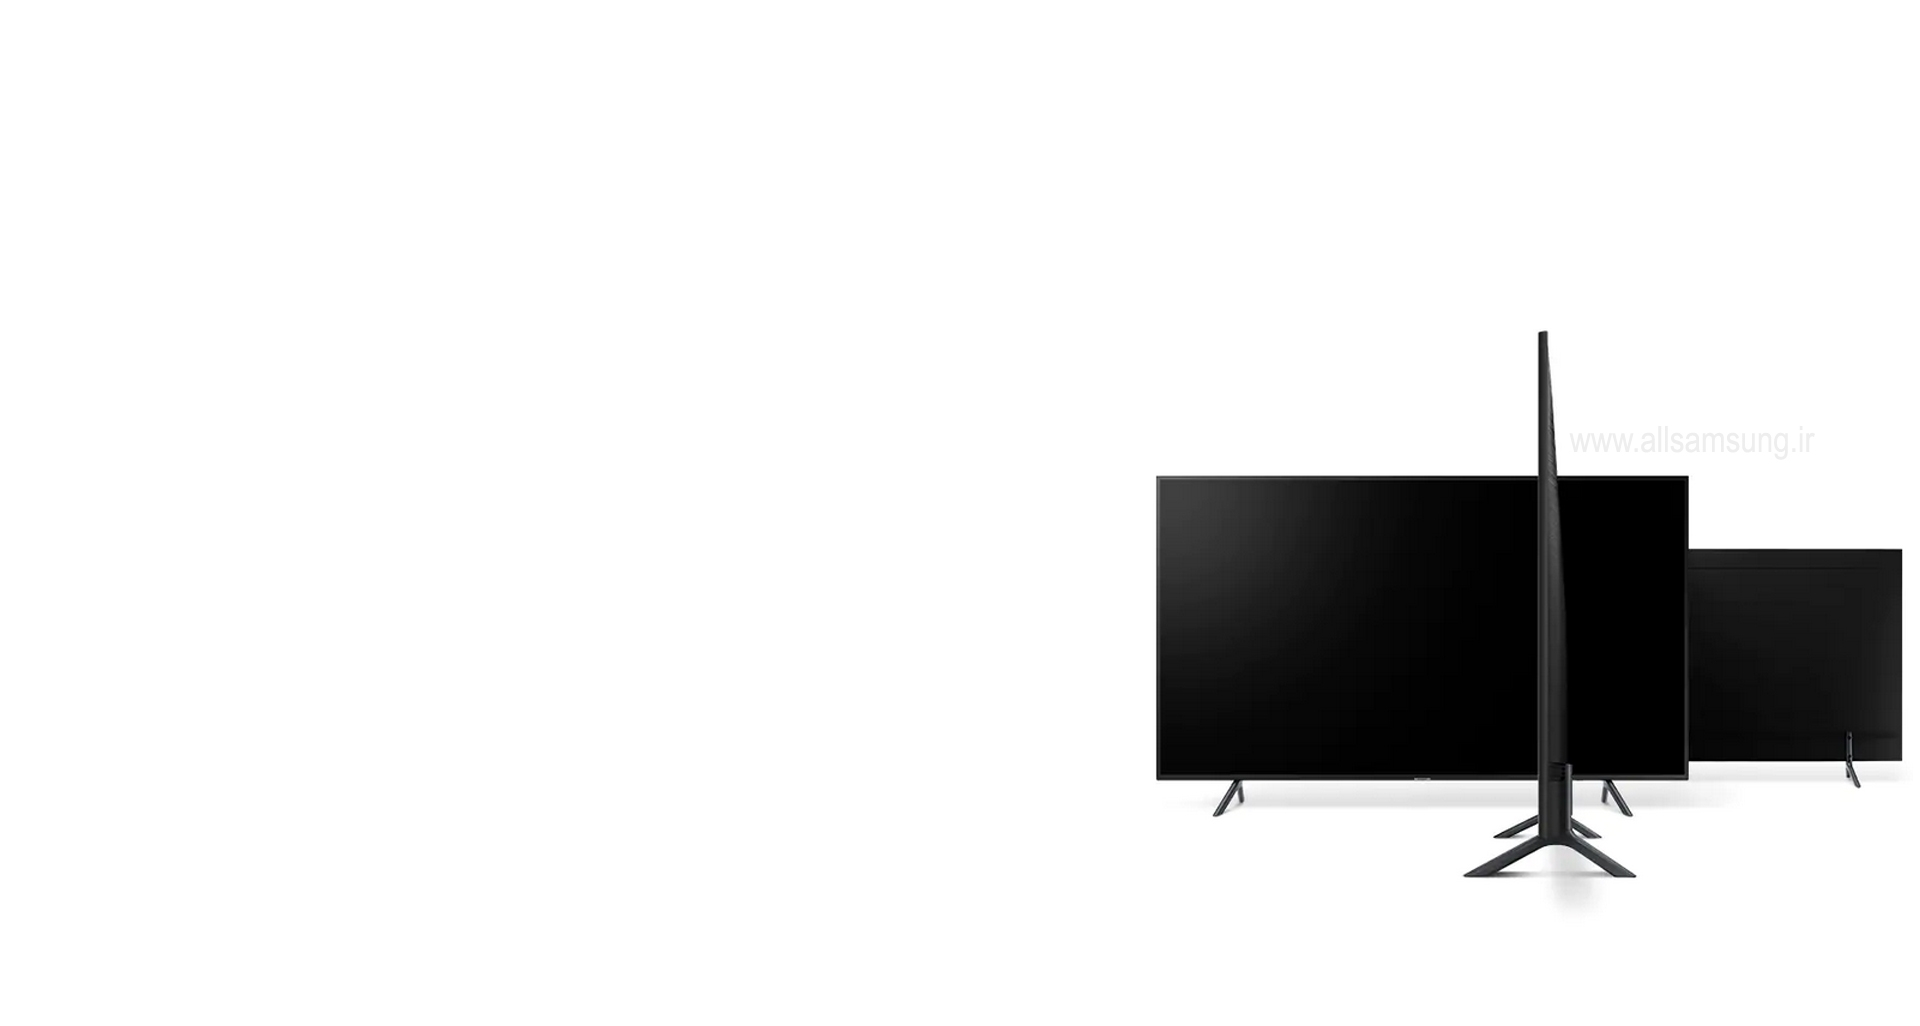 RU7100، تلویزیونی با طراحی باریک